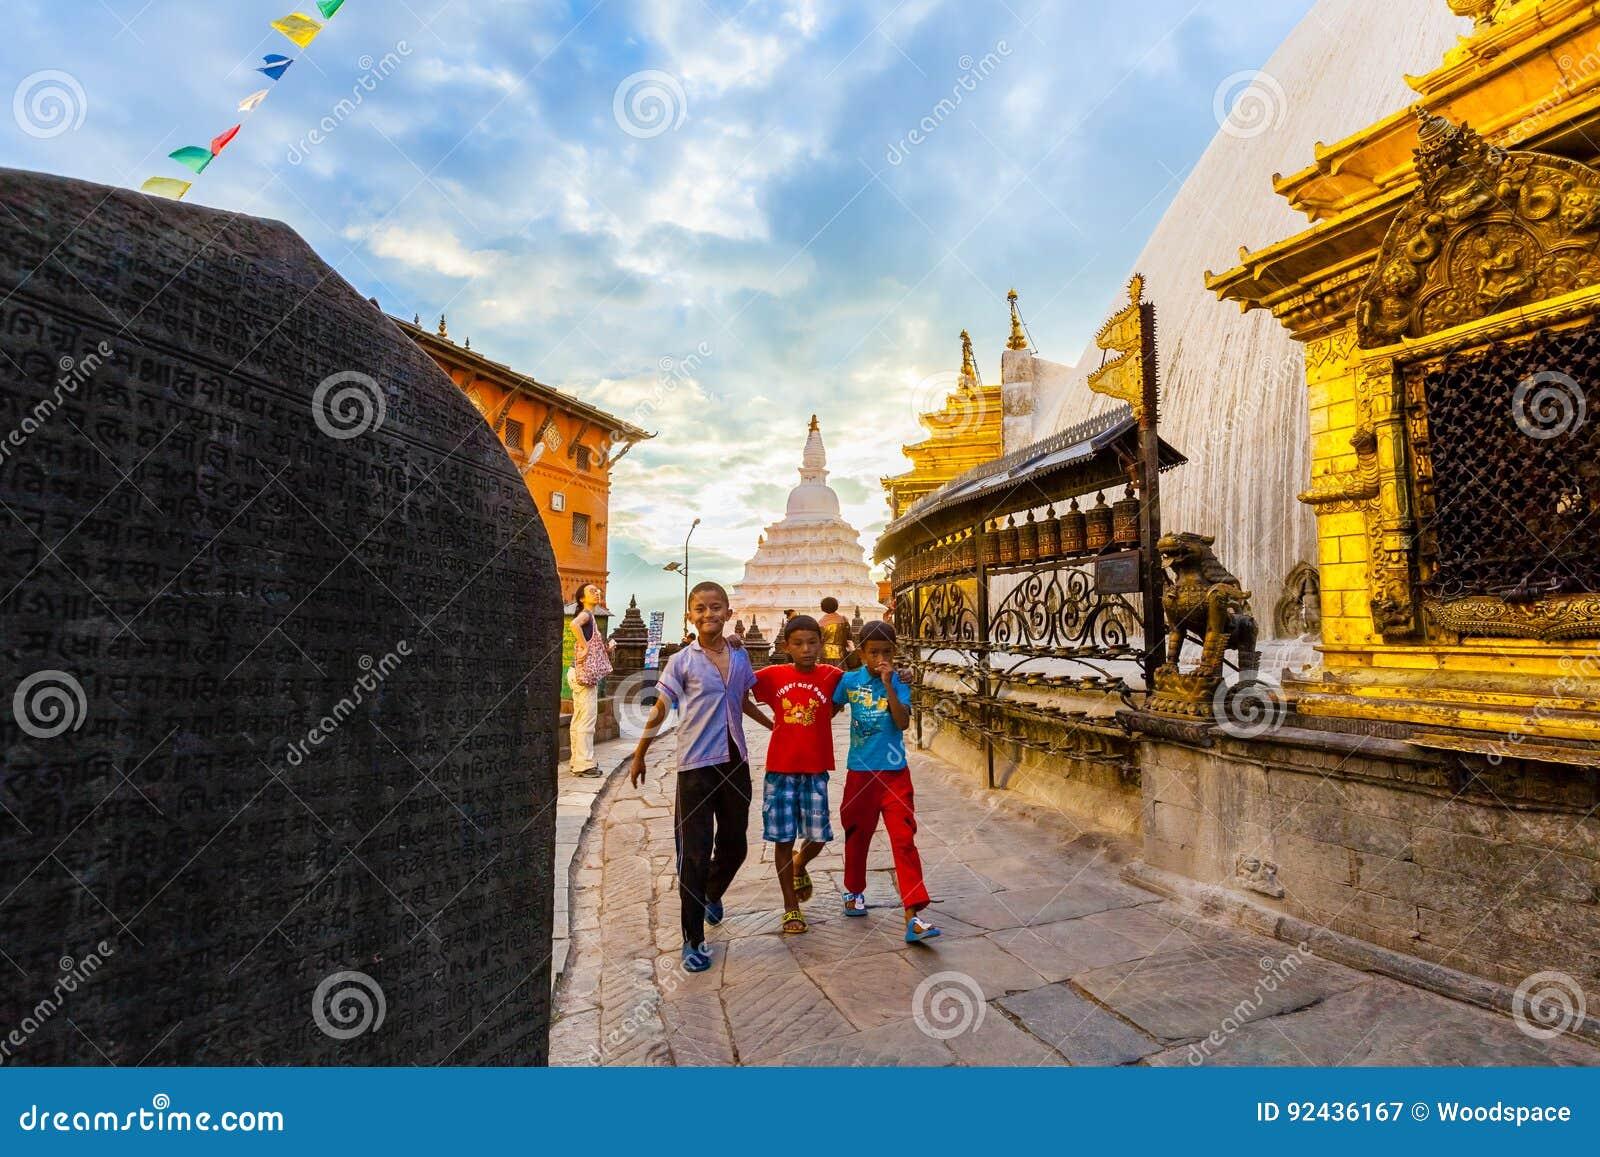 Crianças de Nepal em Swayambhunath, Kathmandu